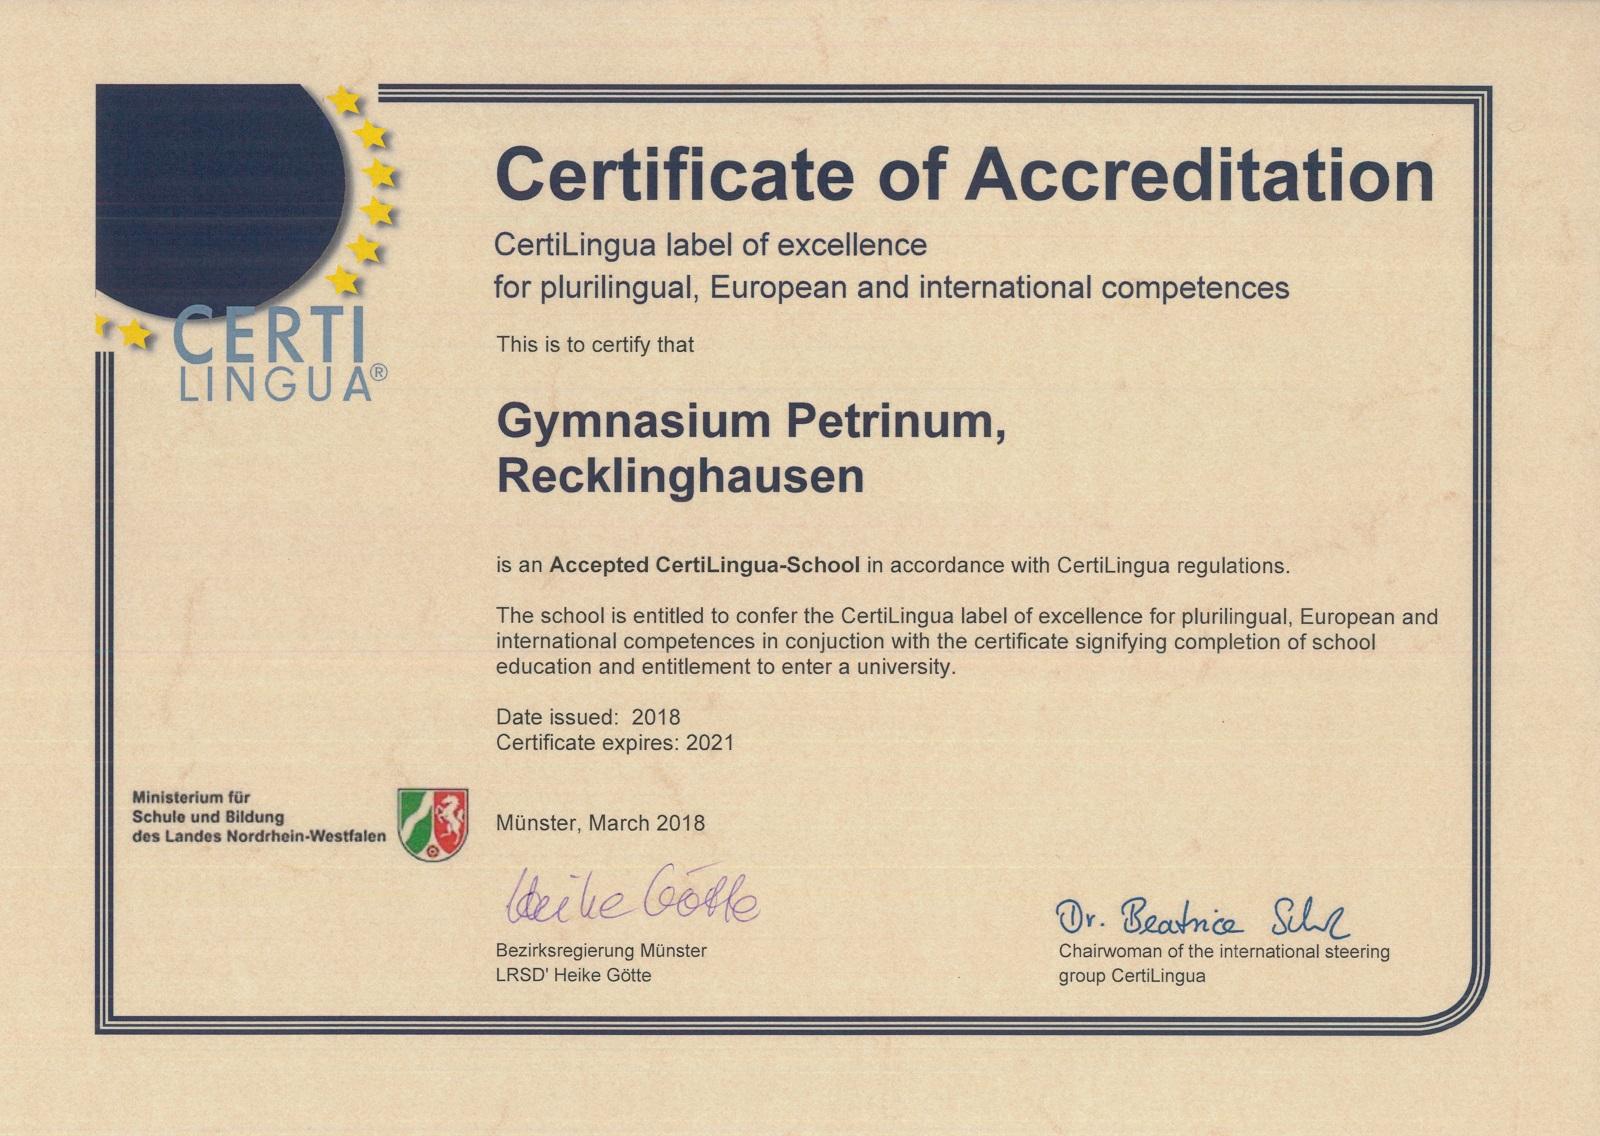 Zertifikate Gymnasium Petrinum Recklinghausen